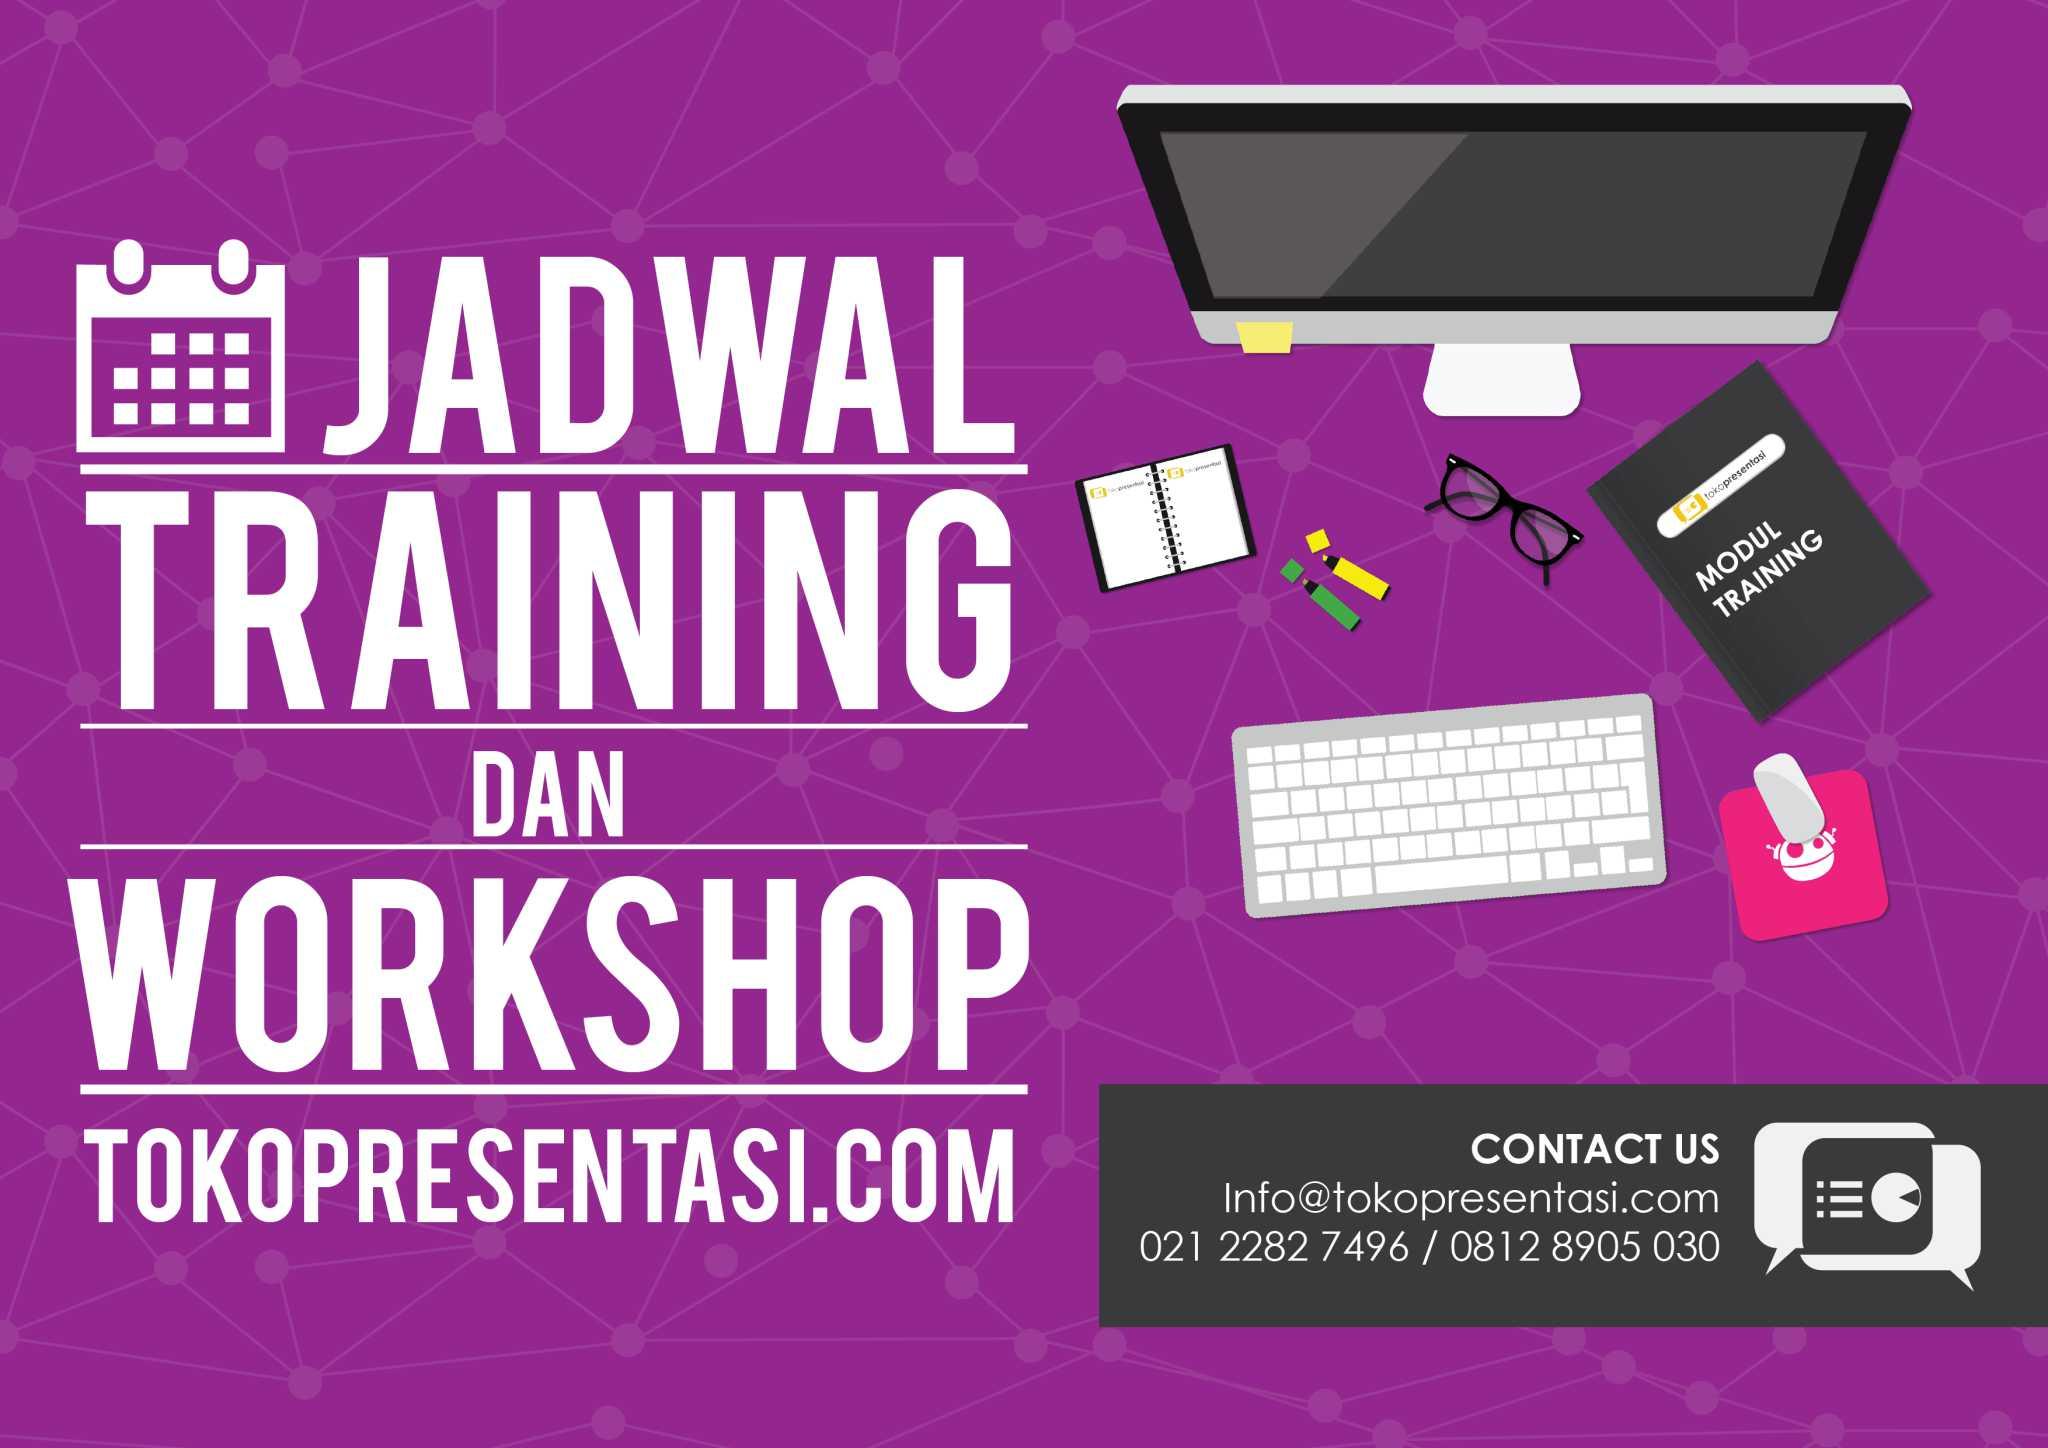 post jadwal training presentasi desain ppt desain slide presentasi powerpoint jasa desain slide ppt_compressed